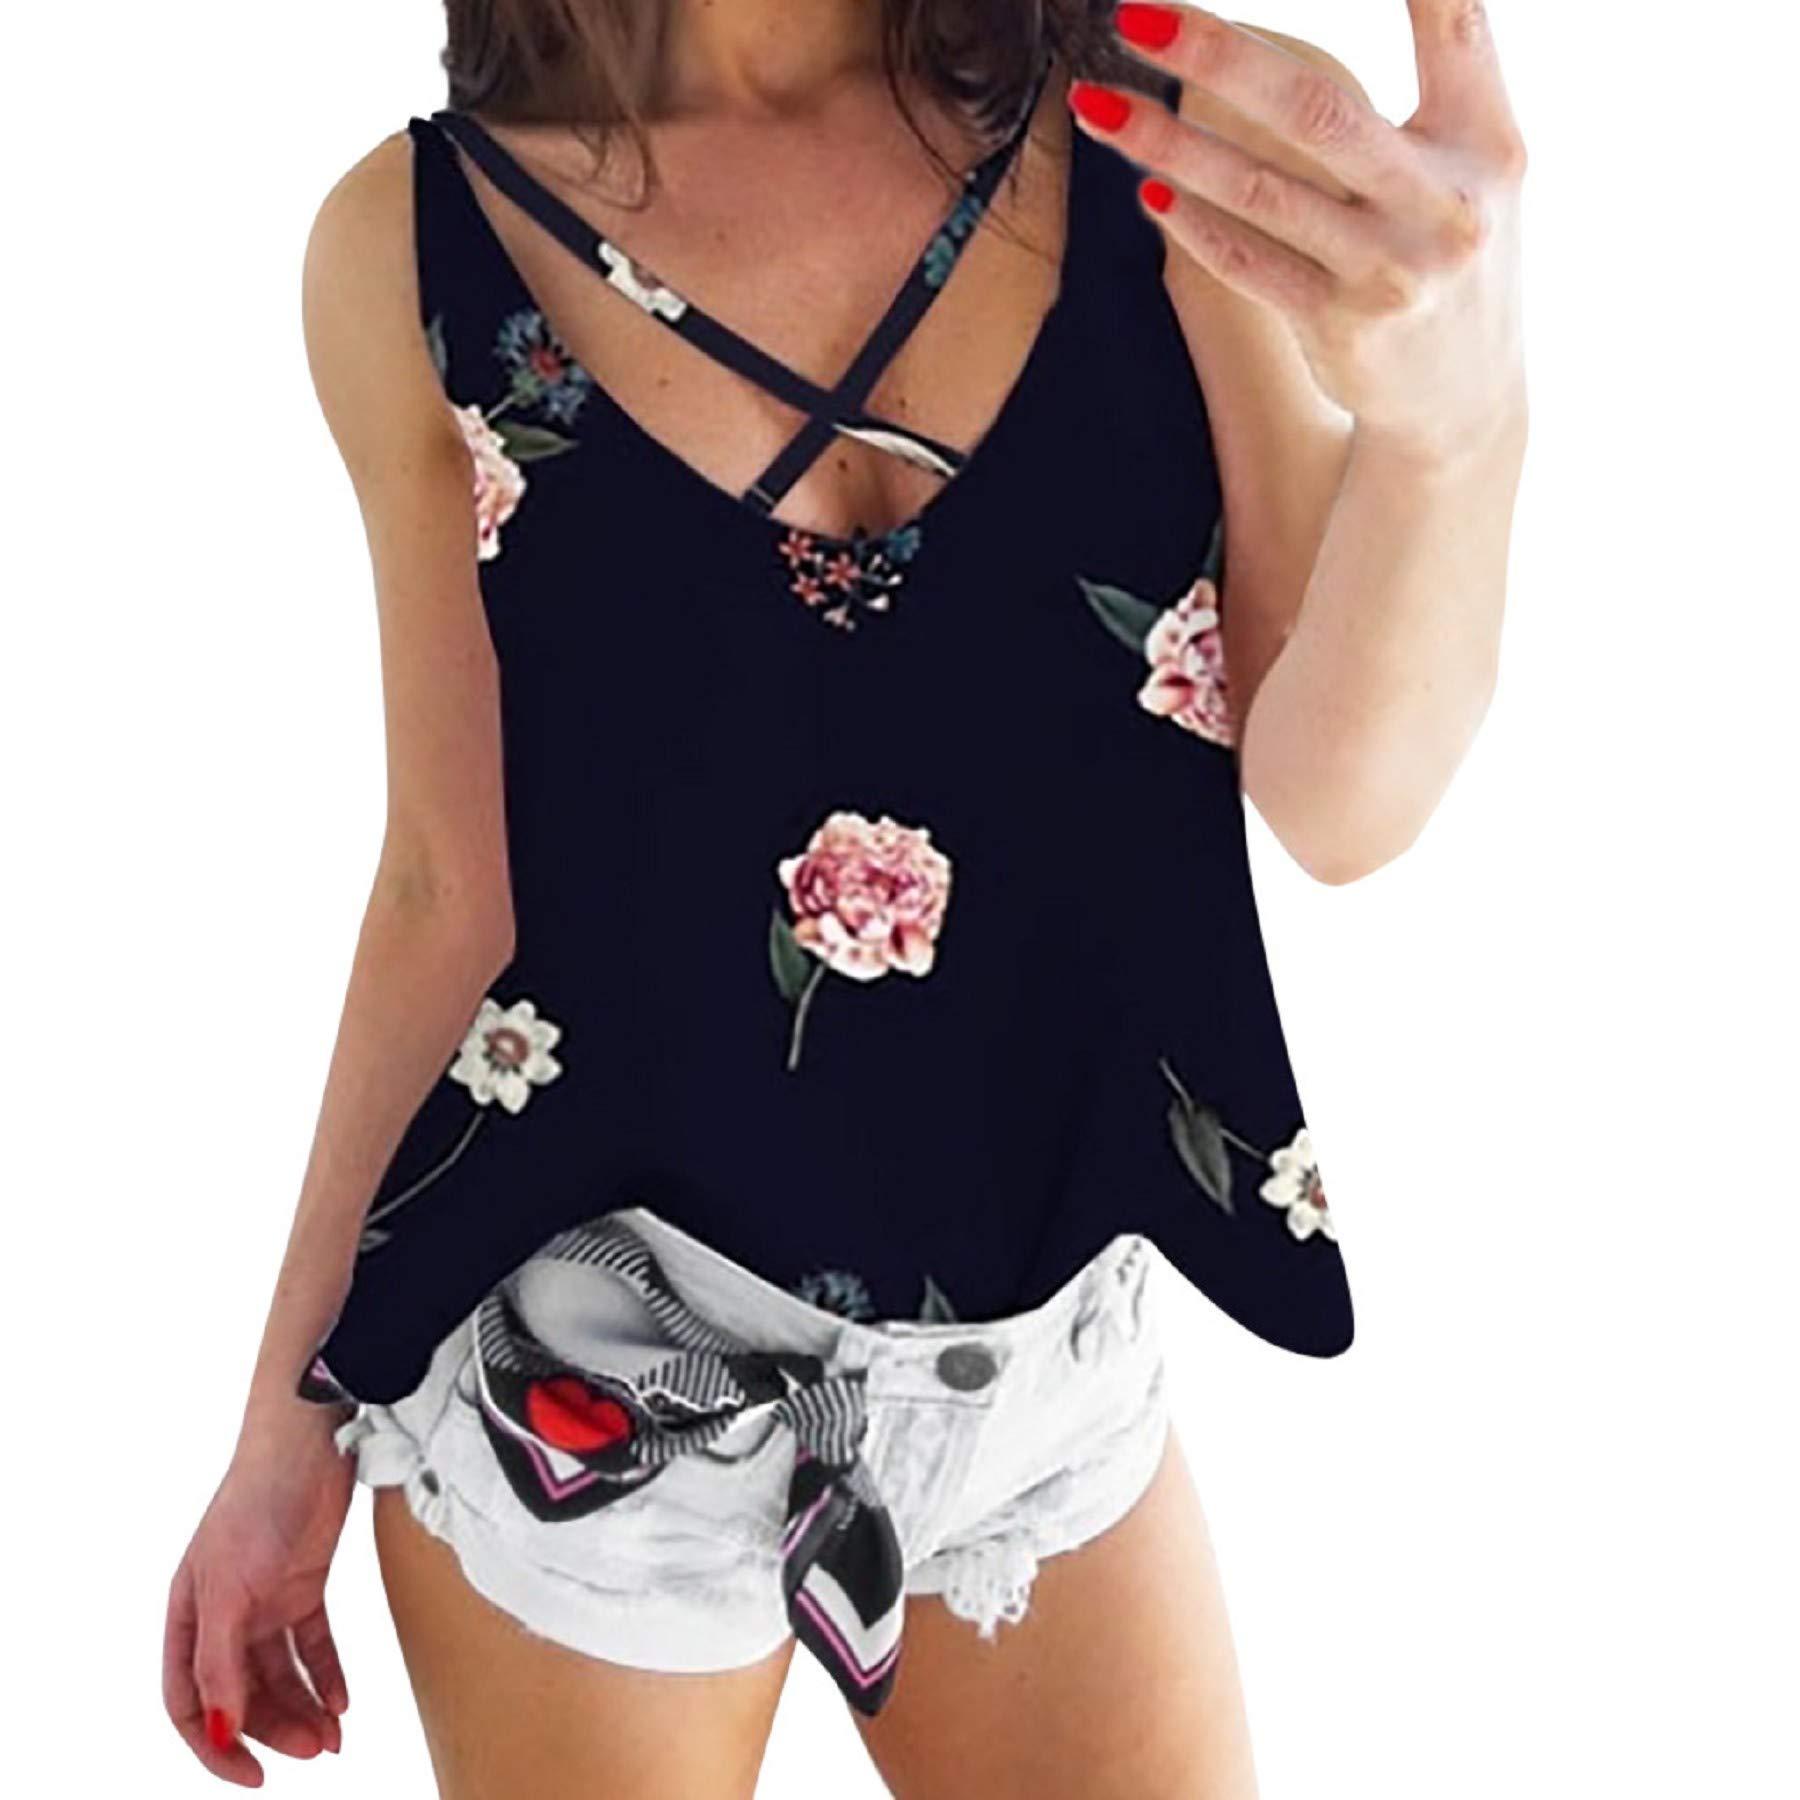 Women's Floral Print V Neck Sleeveless Camis Tops Ladies Casual Summer Criss Cross Blouse Tank Top Vest Black